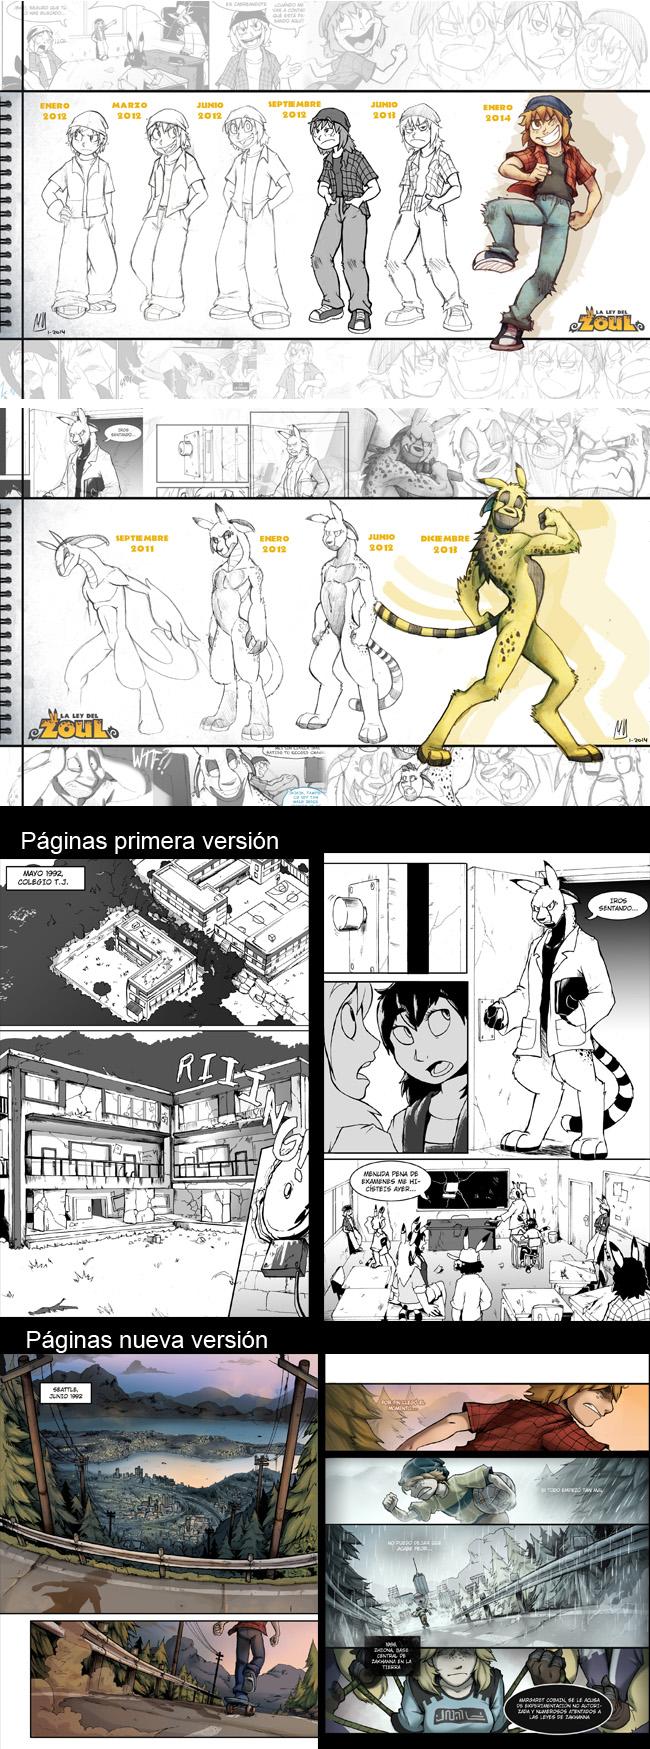 proyecto-fin-curso-manga-madrid-trabajos-alumnos-academiac10